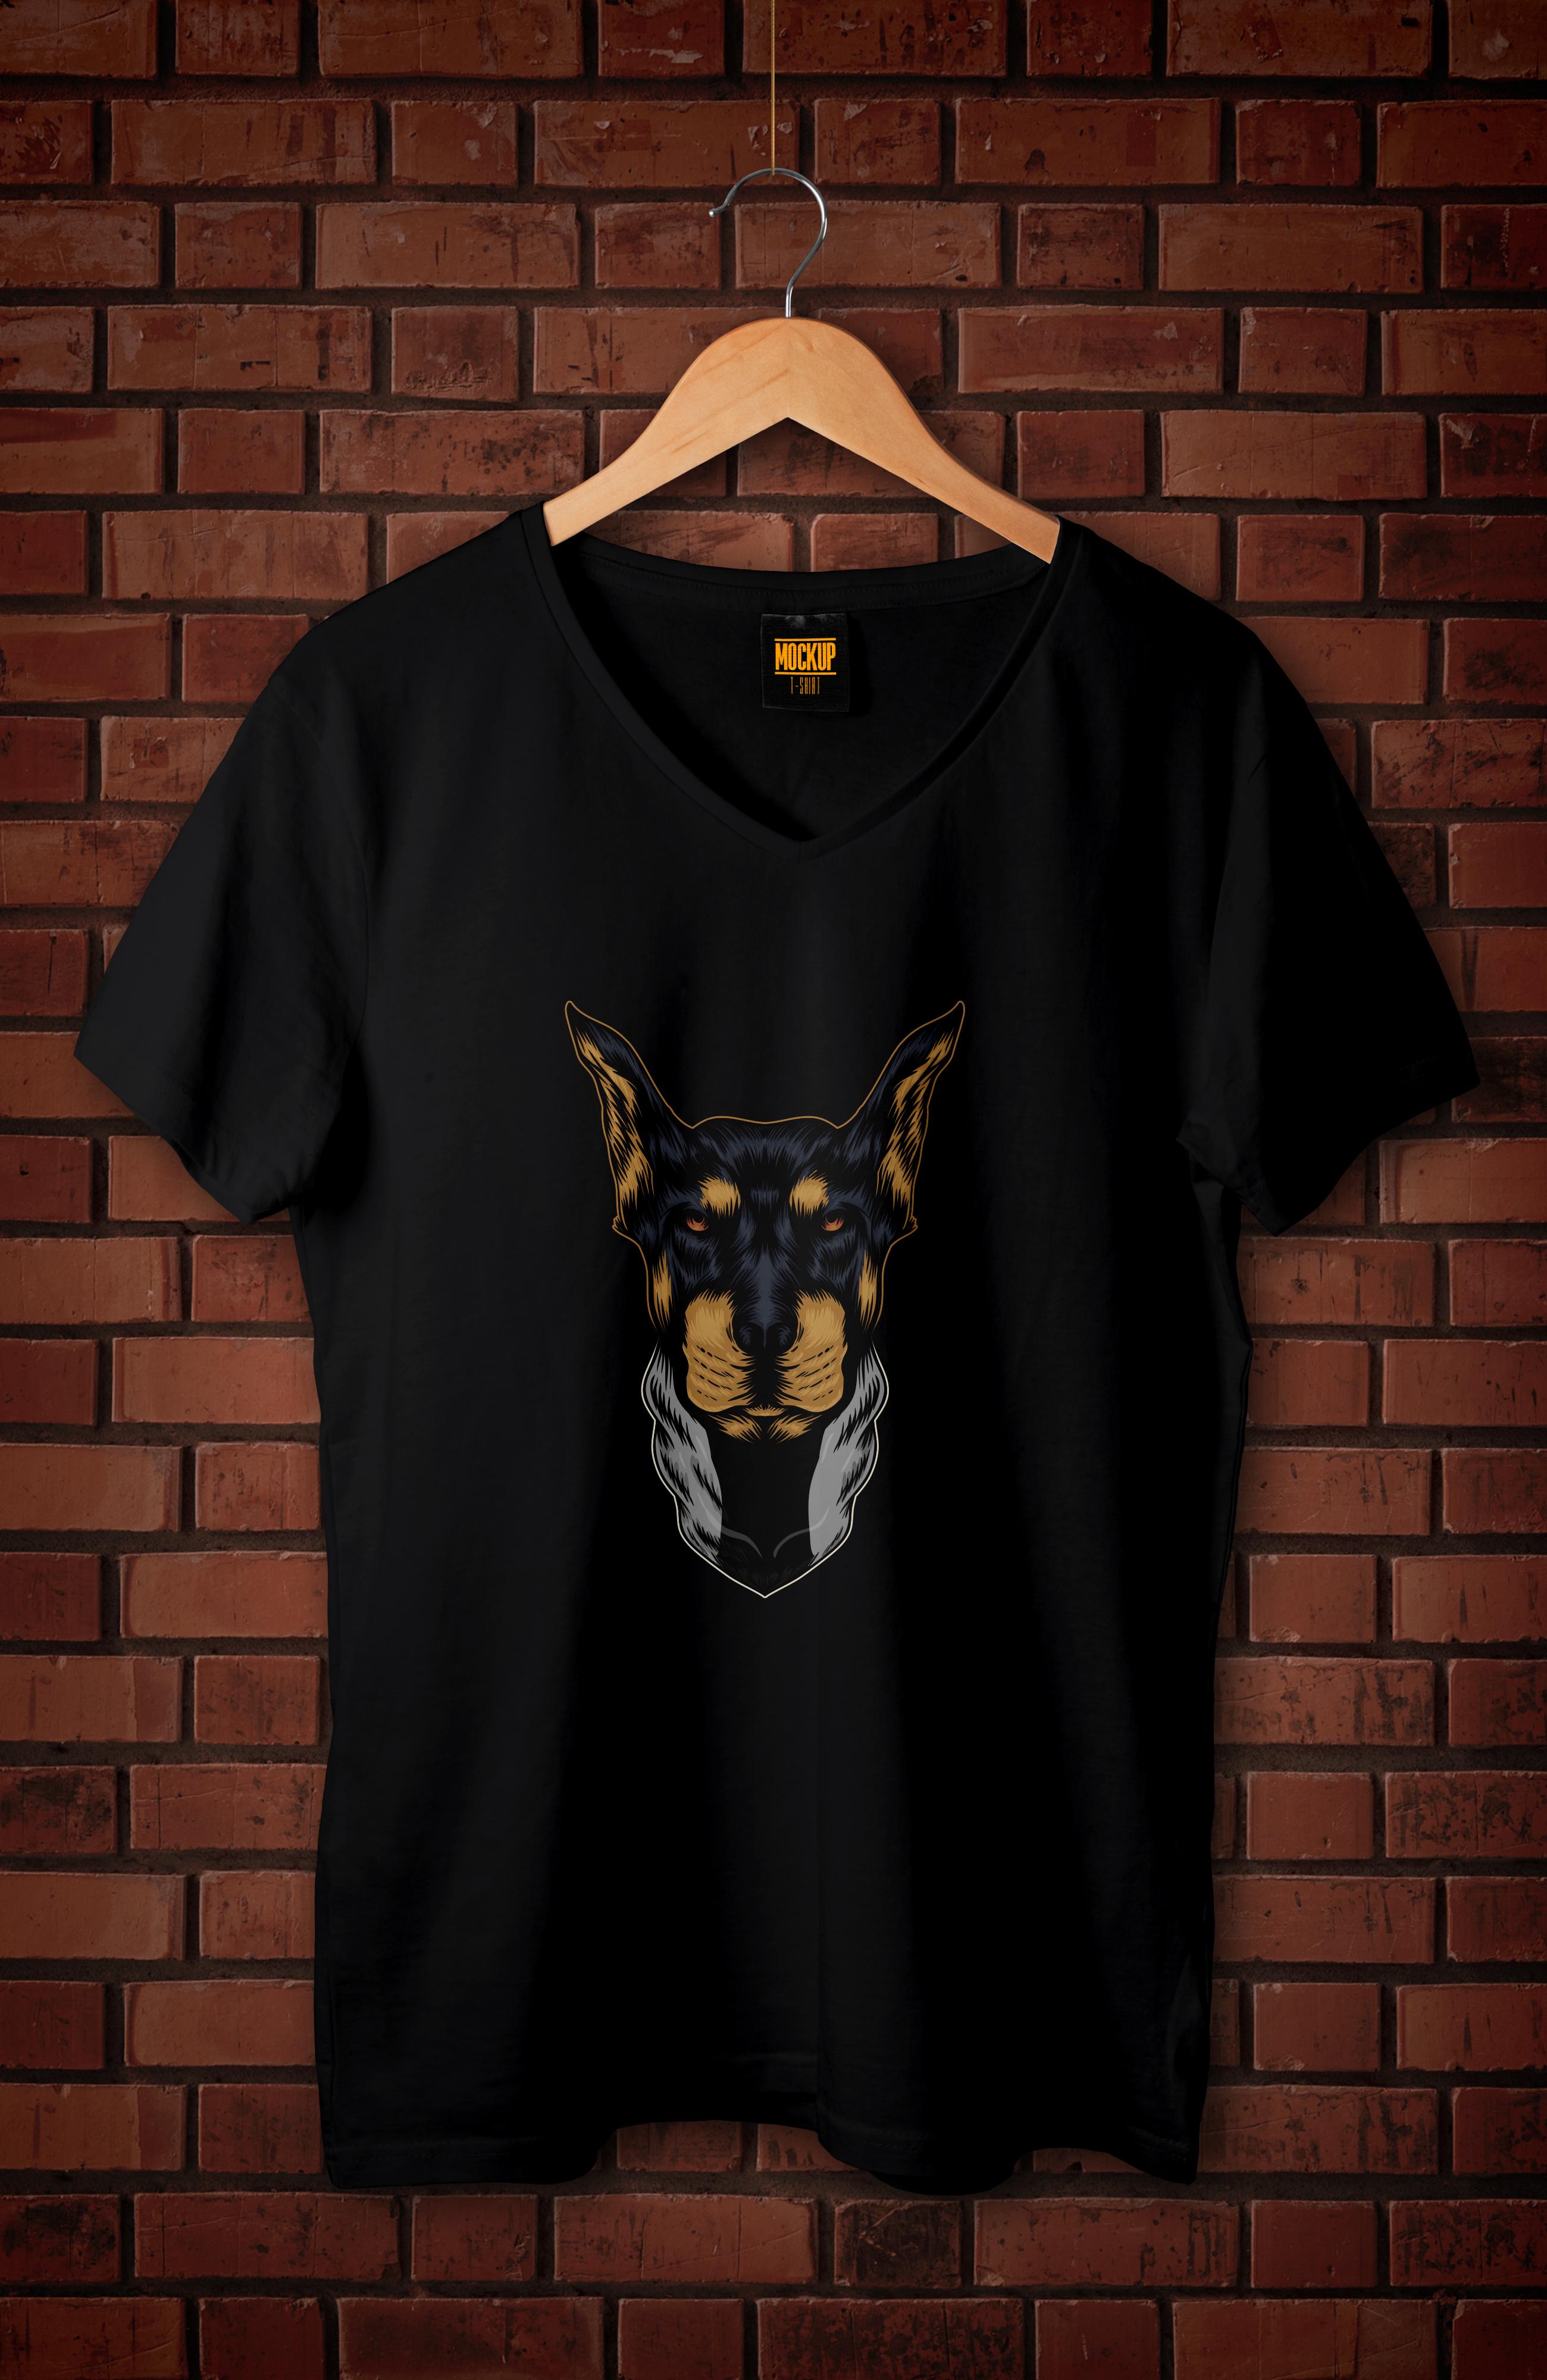 I will make custom and trendy t-shirt design